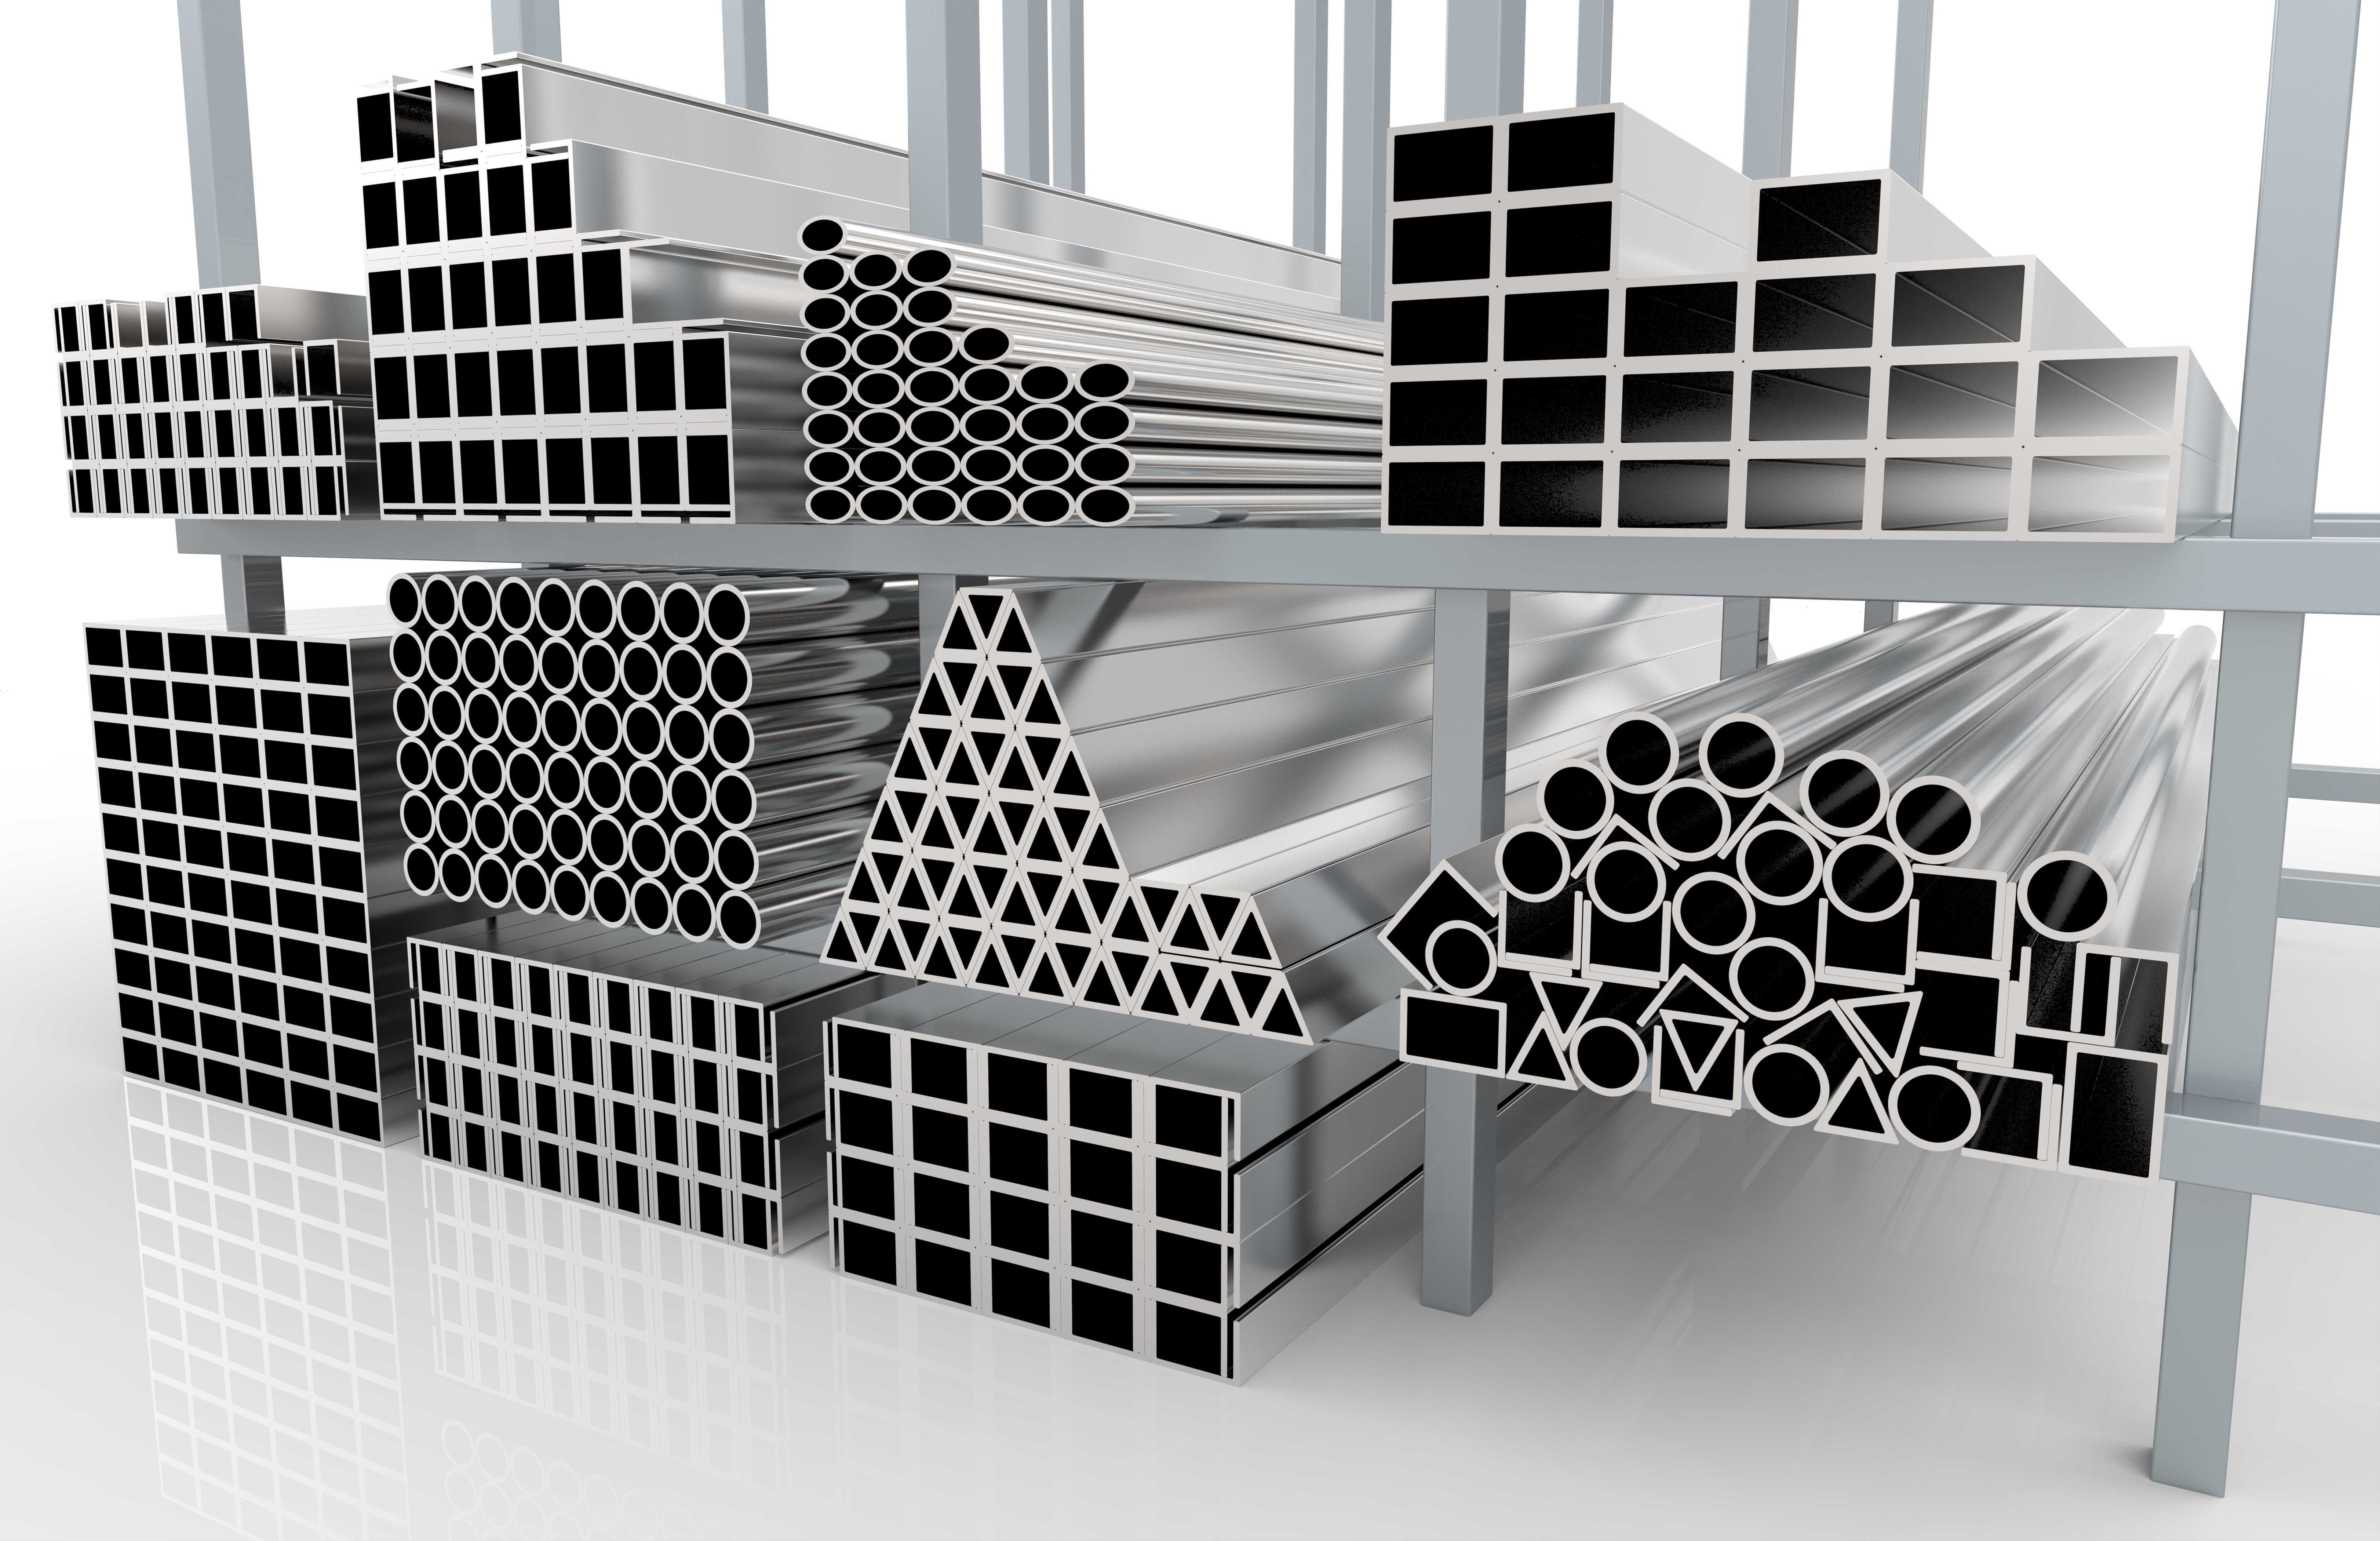 BWC_Group_Aluminium_extrusion_stockholding.jpg